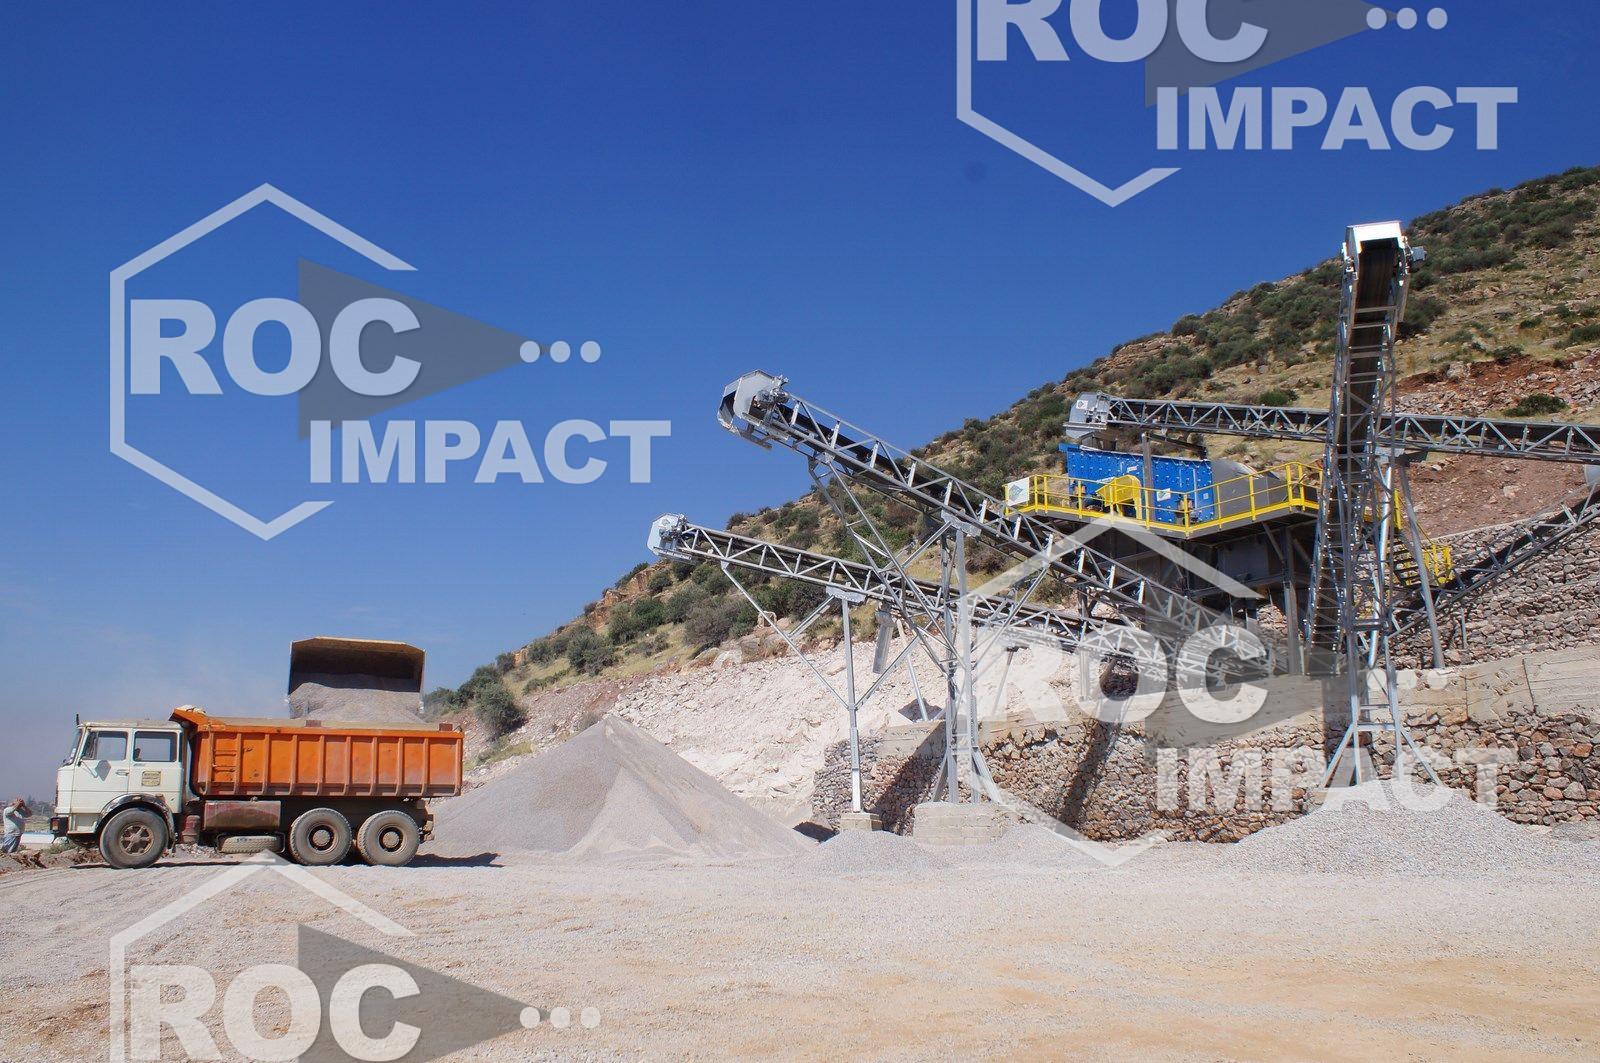 planta de trituración de 300 t / h de 0/25 mm (destino algerie)